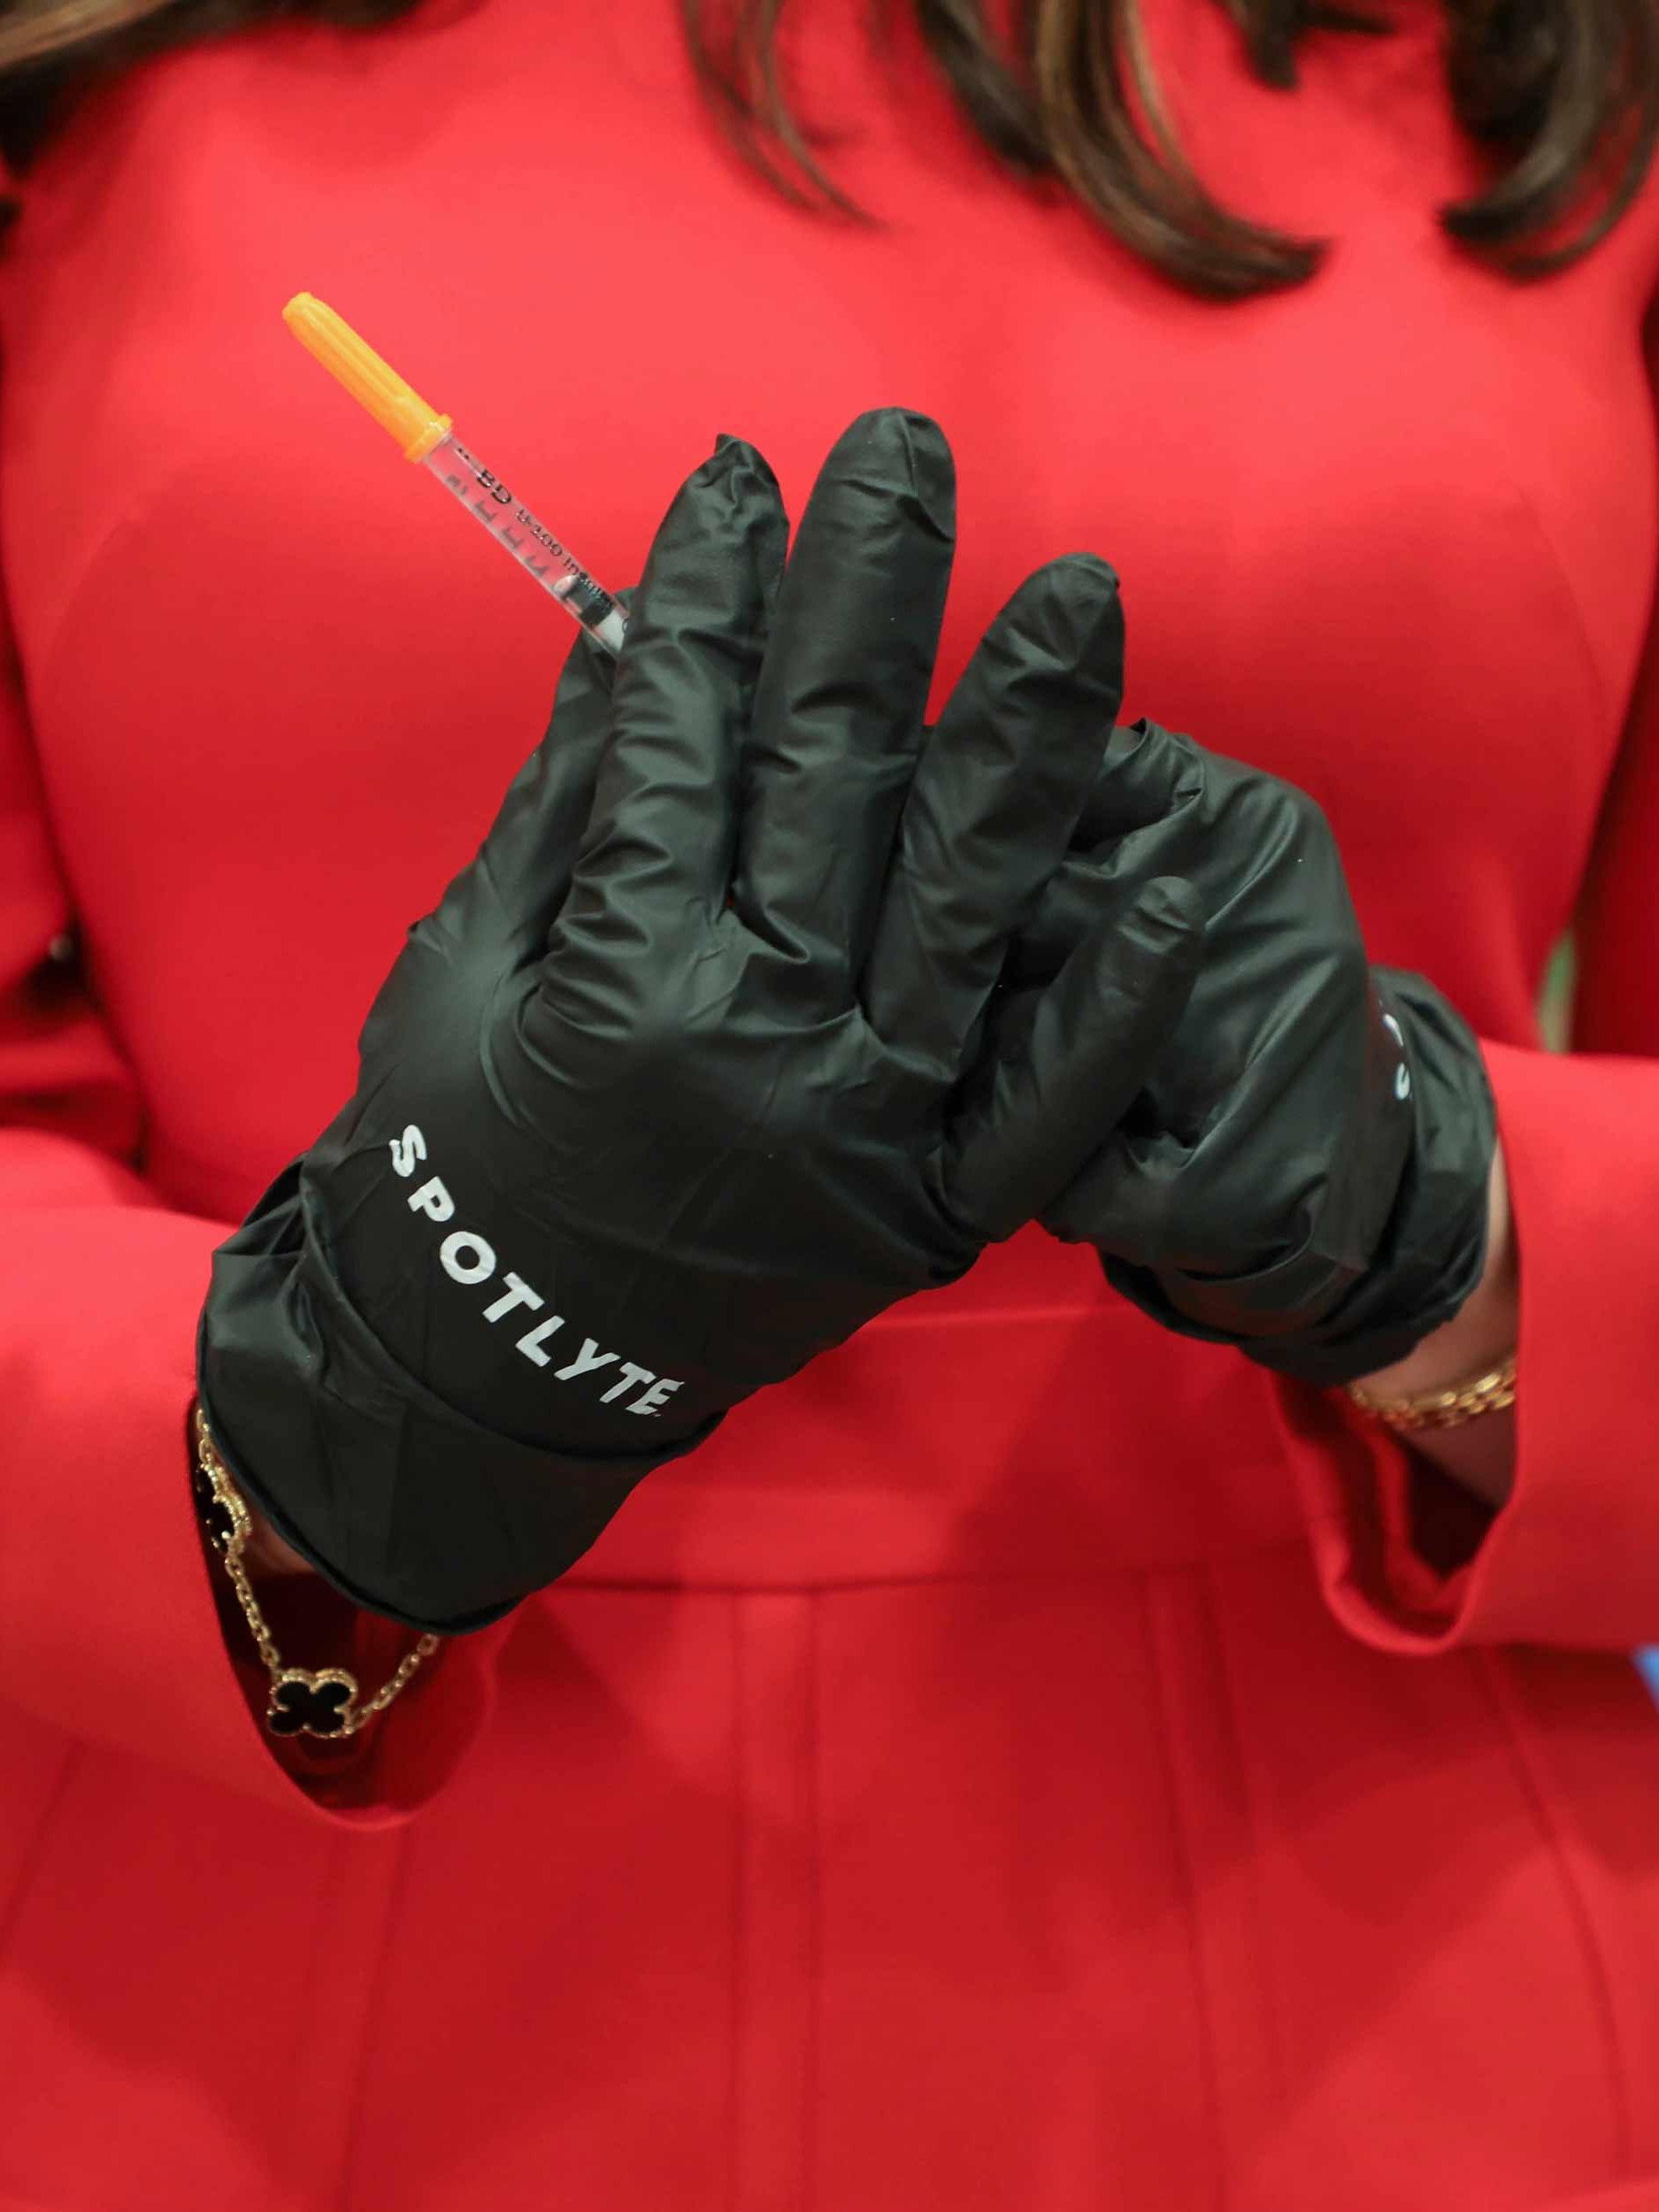 Spotlyte Gloves